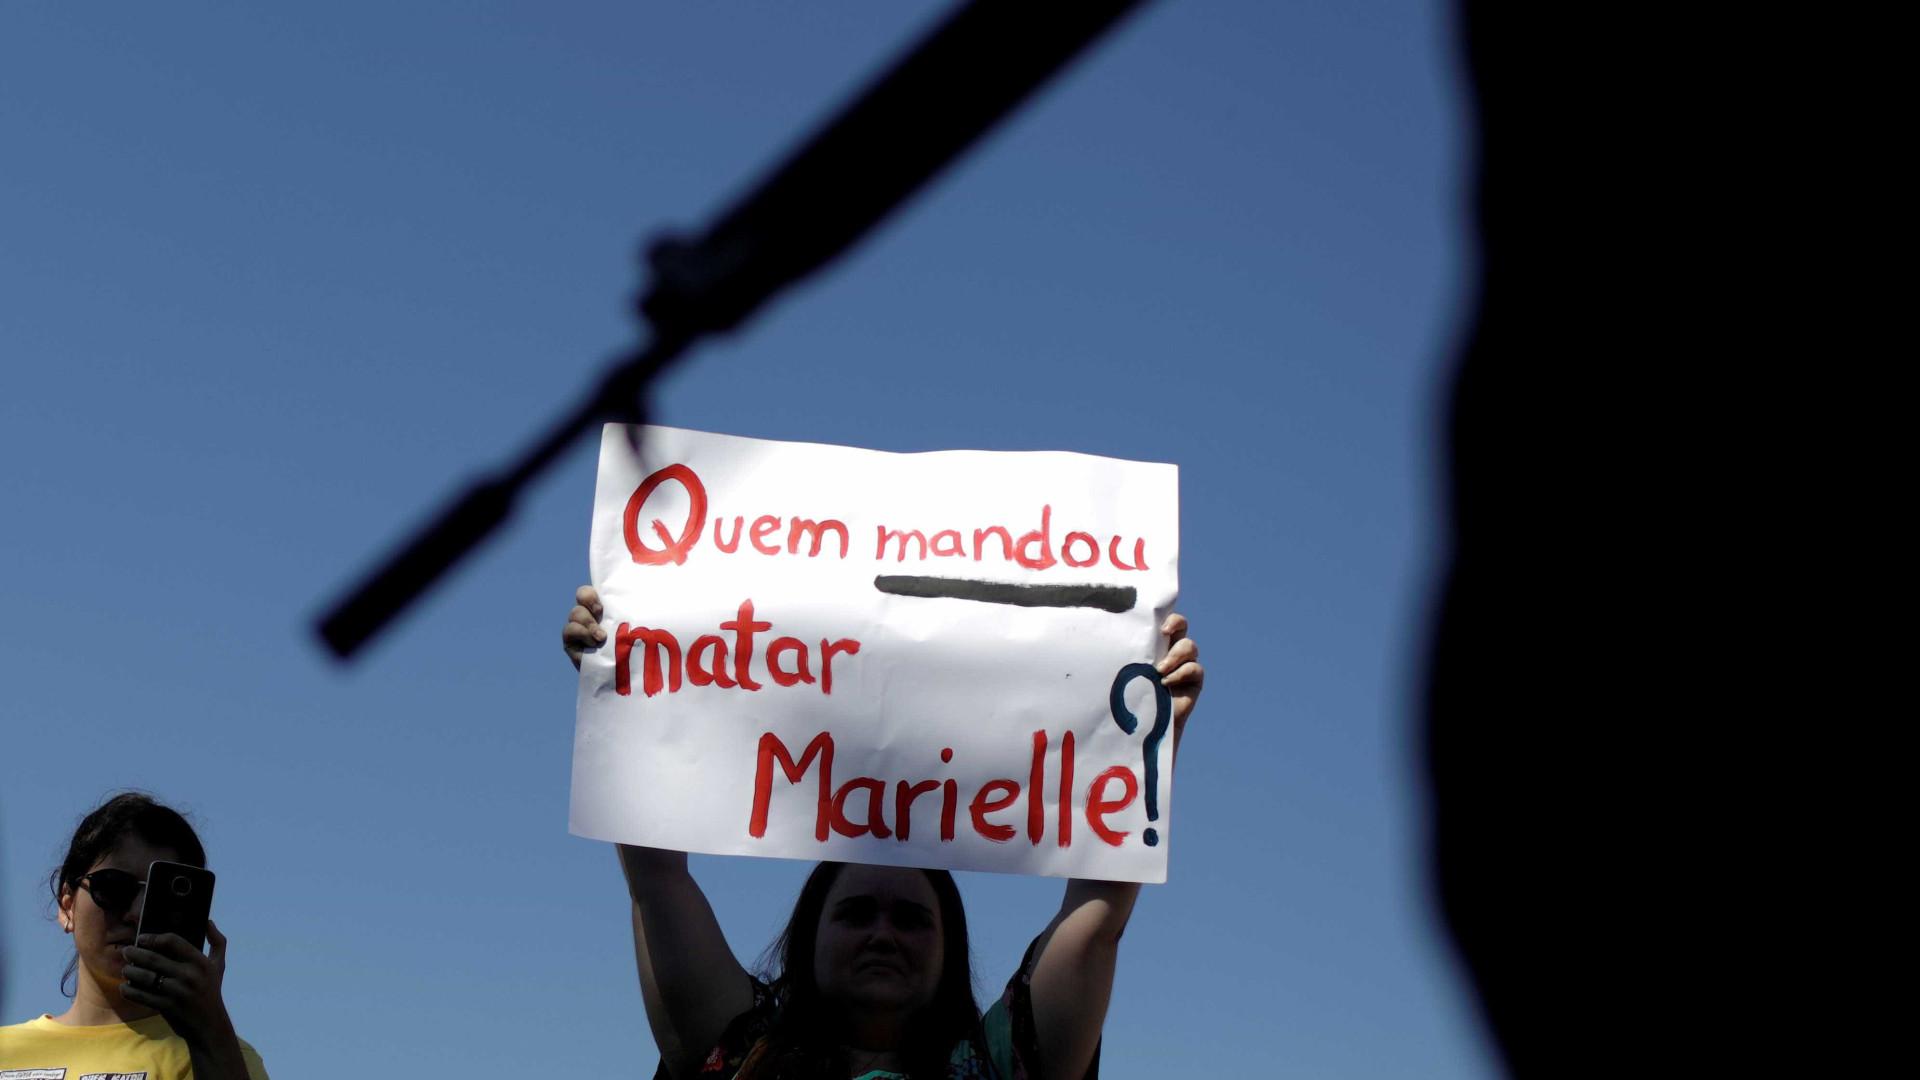 Investigado no caso Marielle, ex-PM é denunciado por outro assassinato